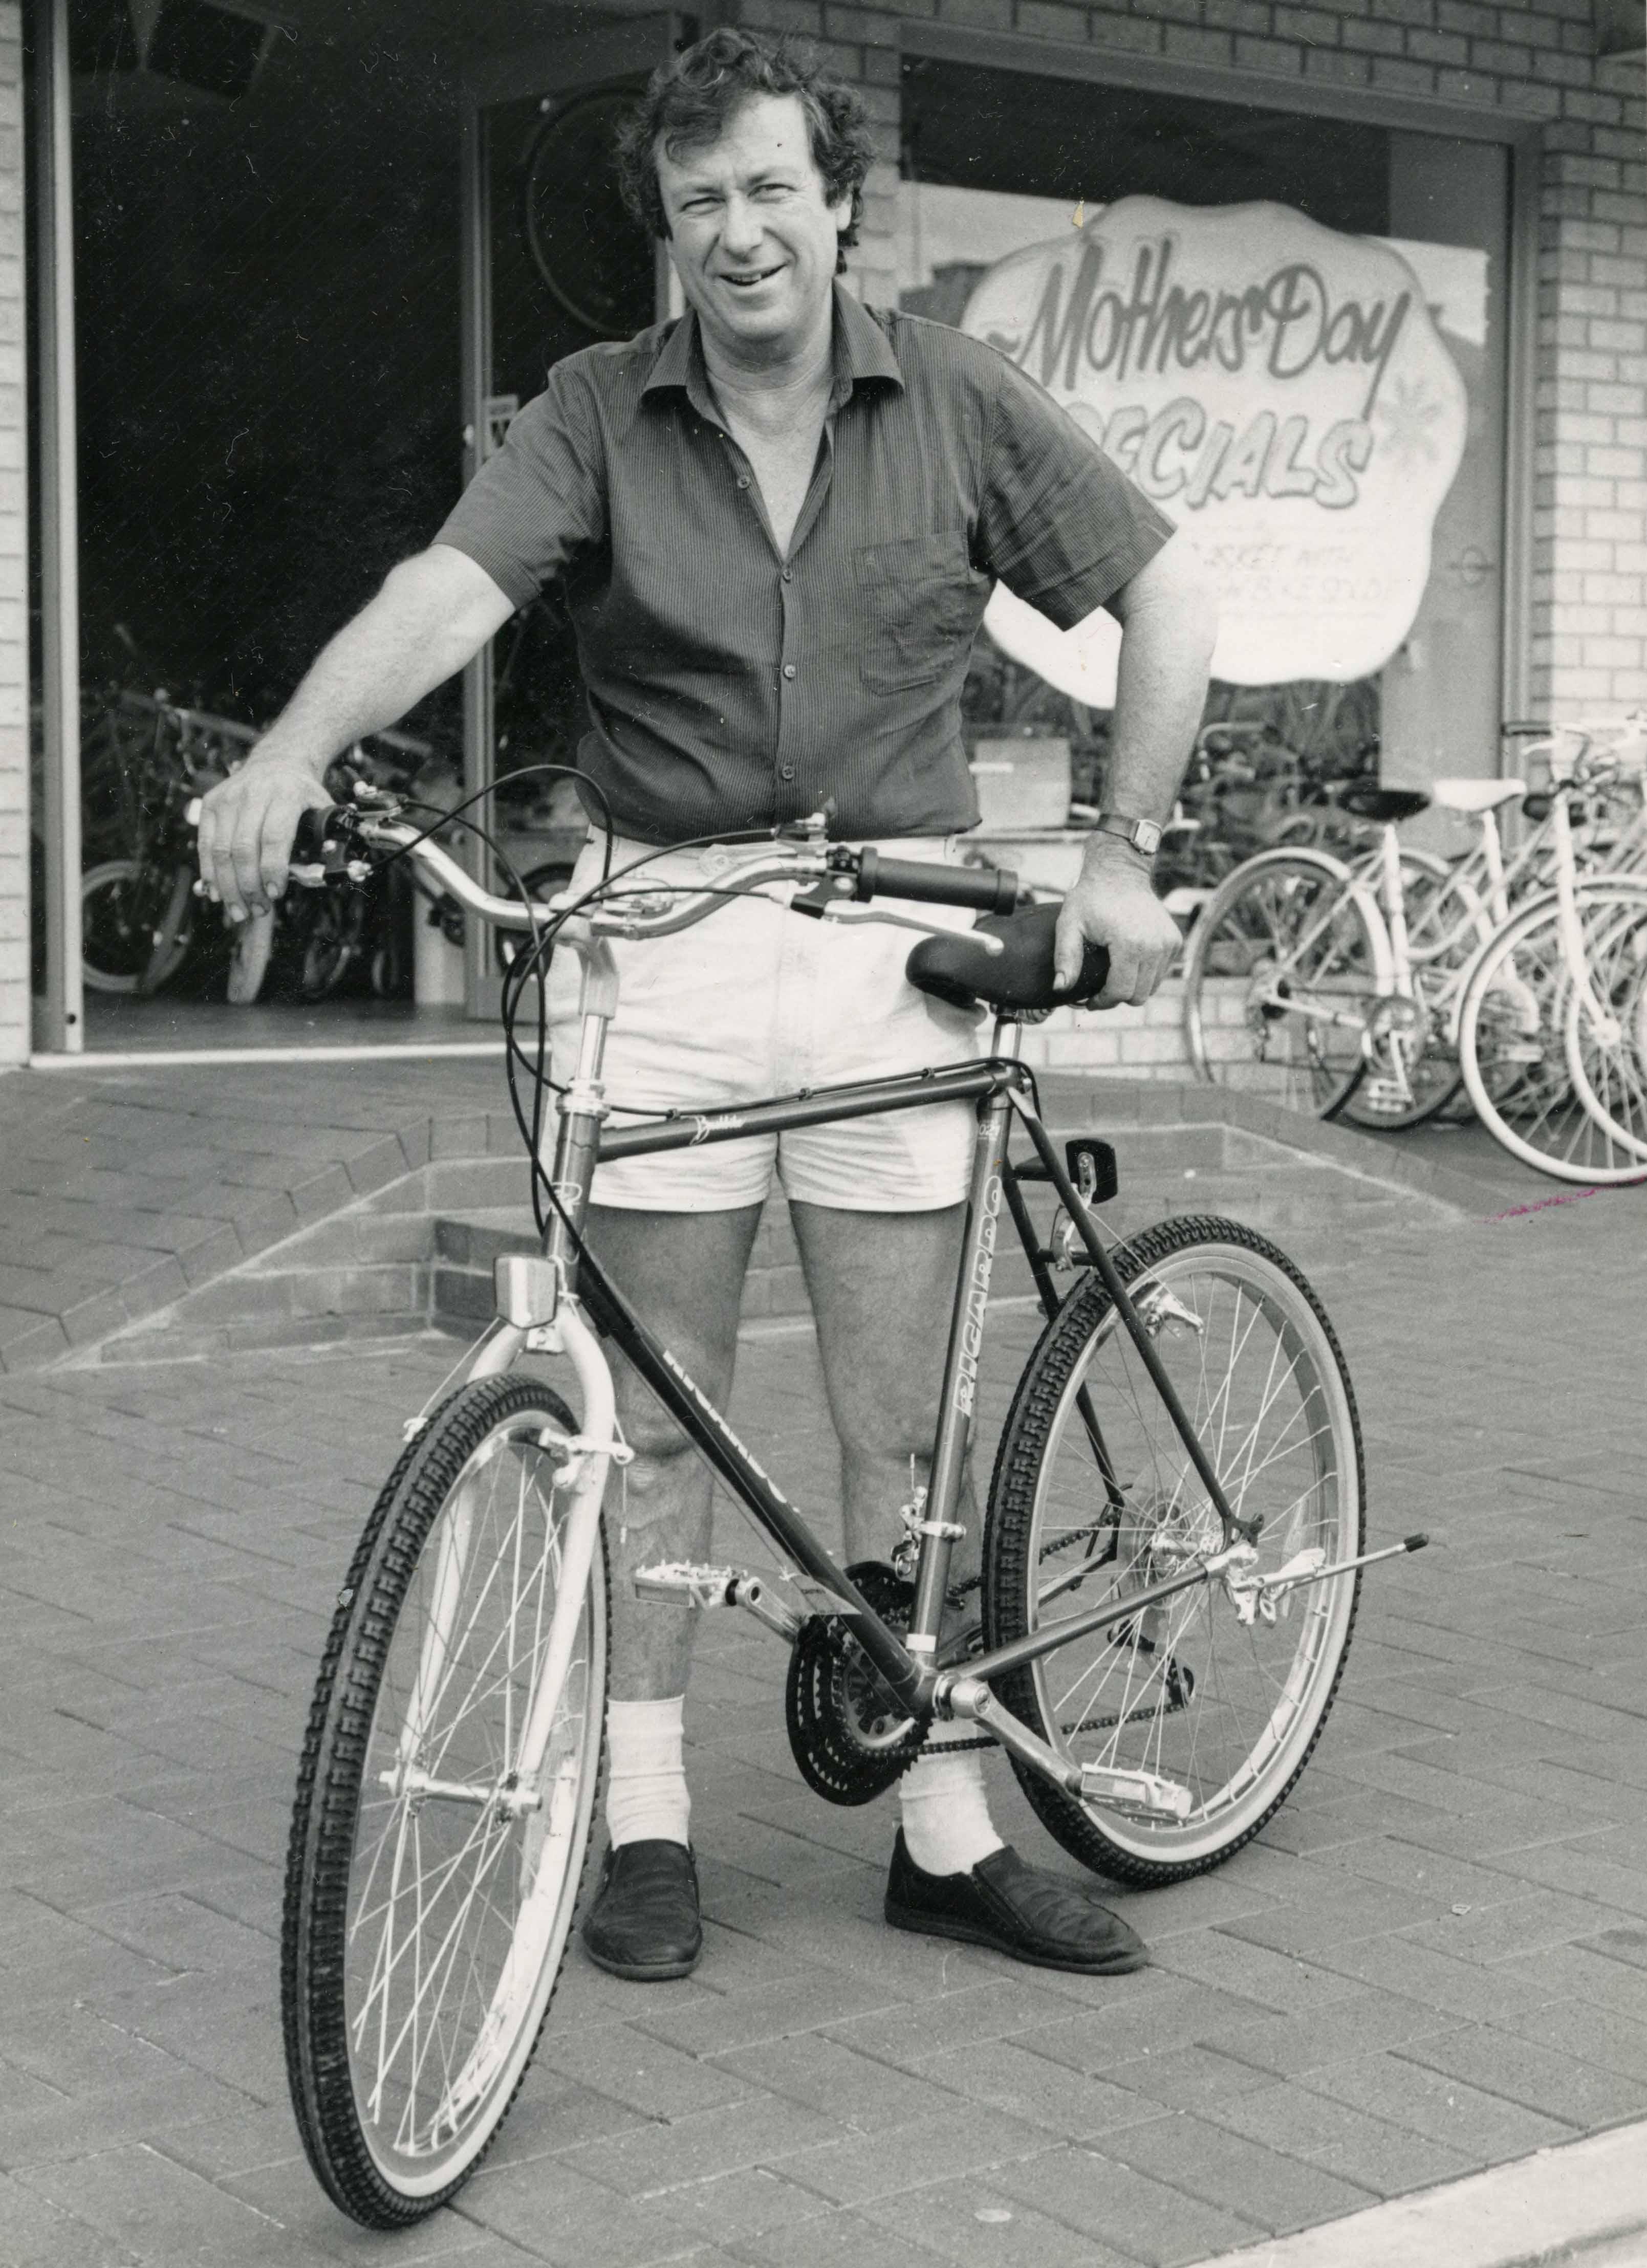 159. Jim Howe of Pal & Panther 1988